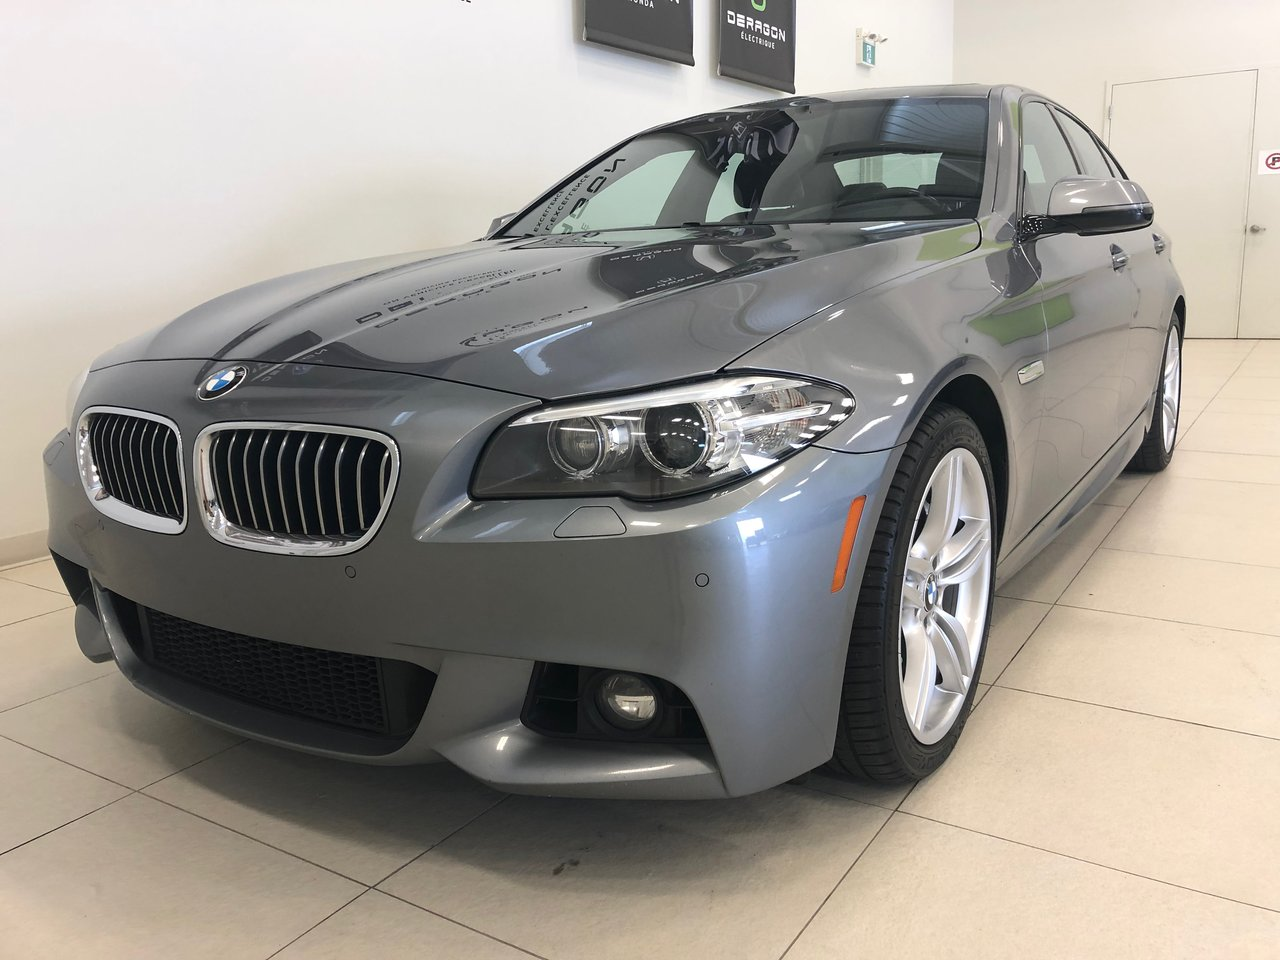 BMW Série 5 2016 535i XDrive, NAV, CAMÉRA, TOIT OUVRANT, M PAC